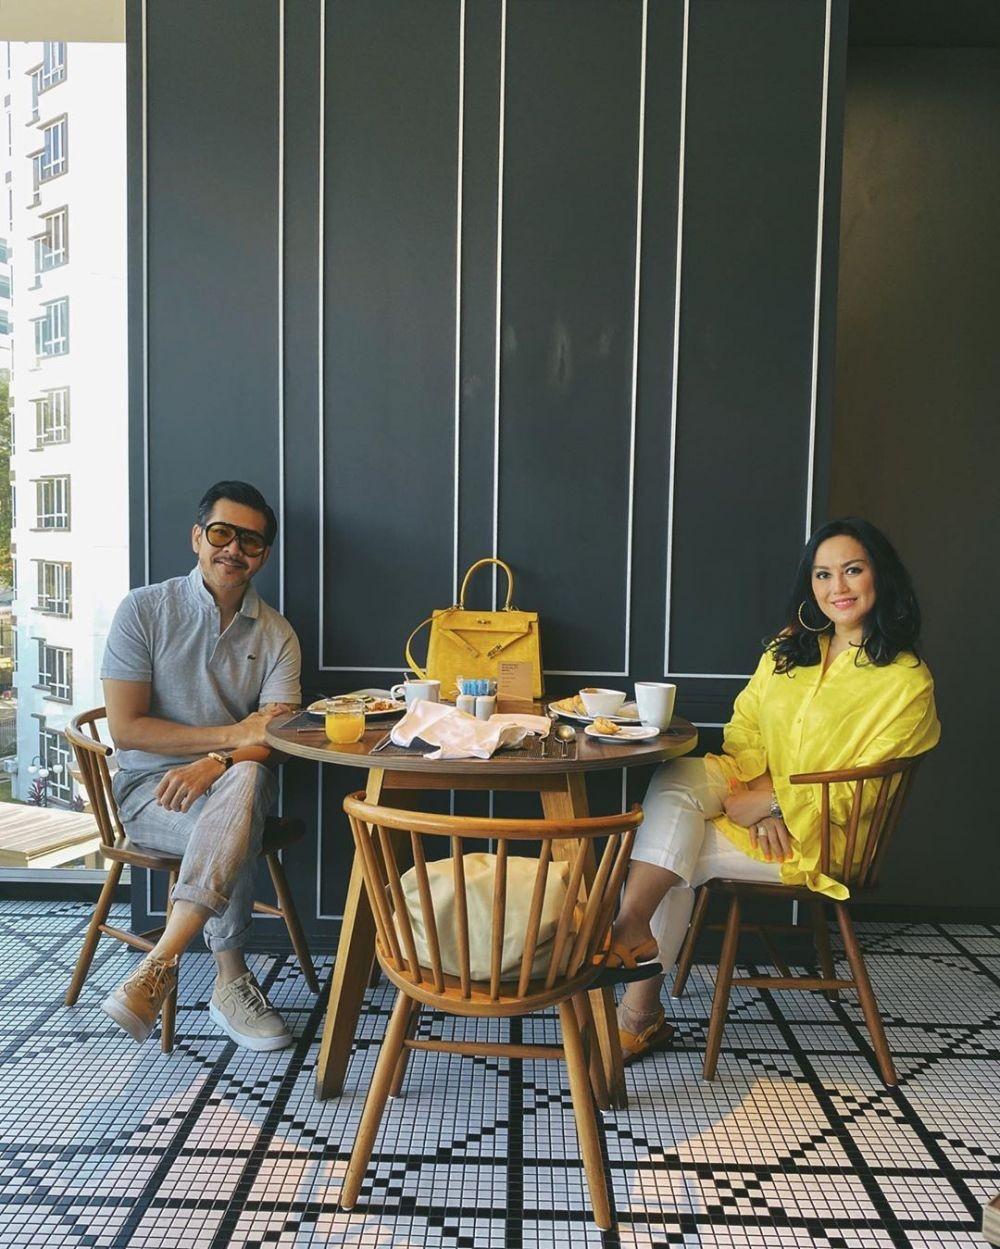 Telah 24 Tahun Menikah, Ini 10 Potret Kemesraan Ferry Salim dan Istri